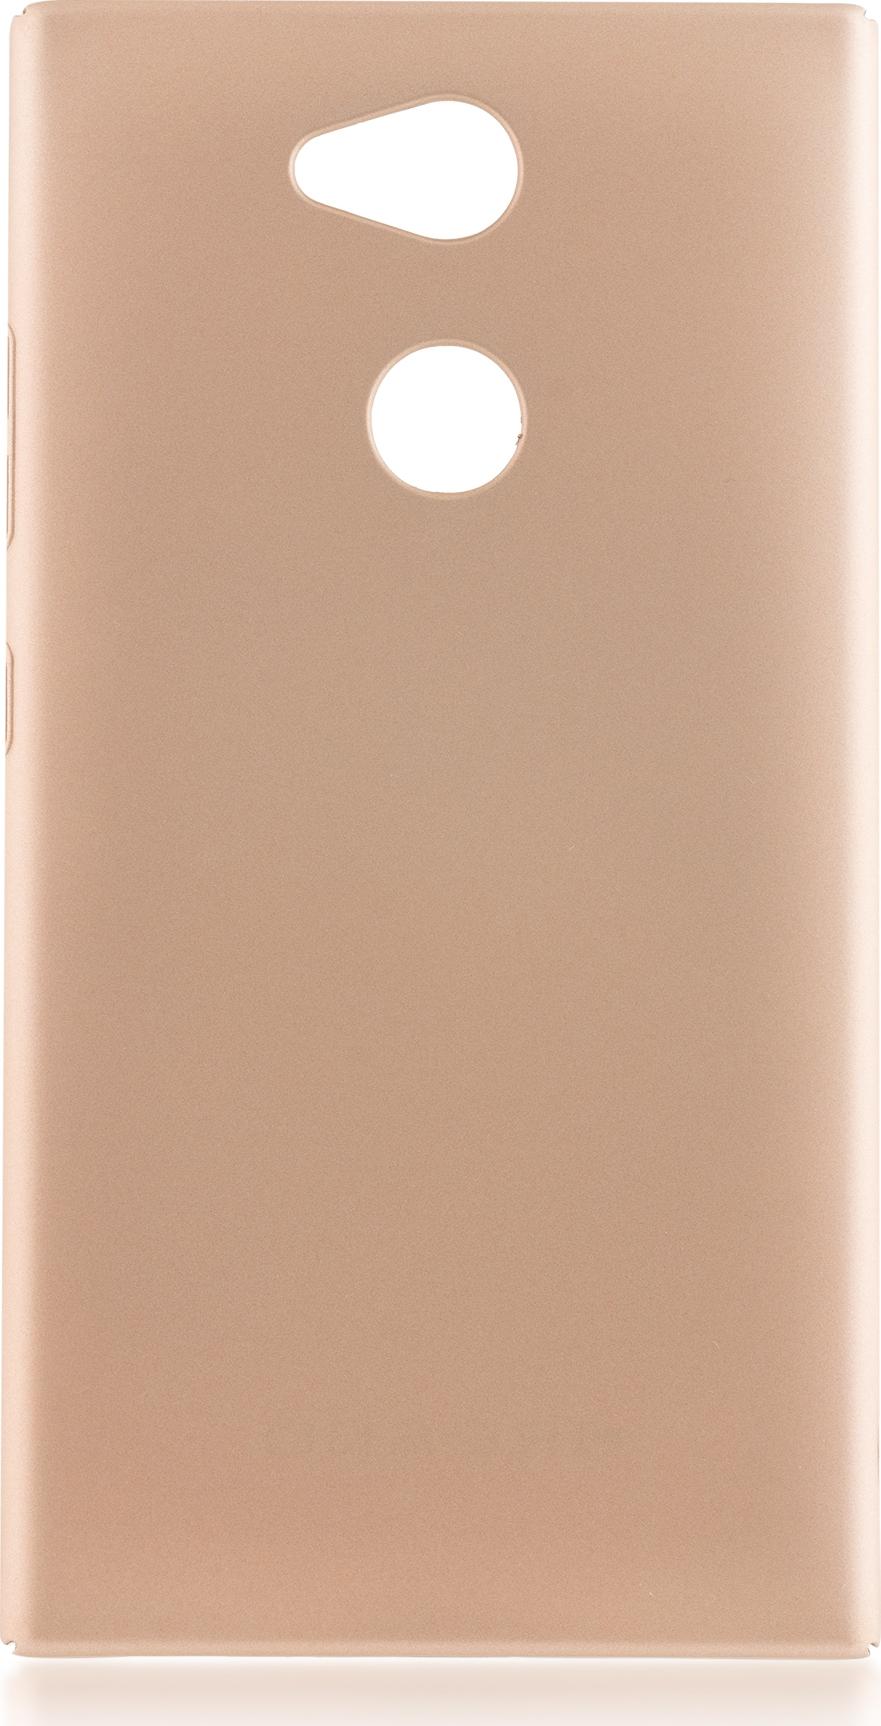 Чехол Brosco 4Side Soft-Touch для Sony Xperia L2, золотой